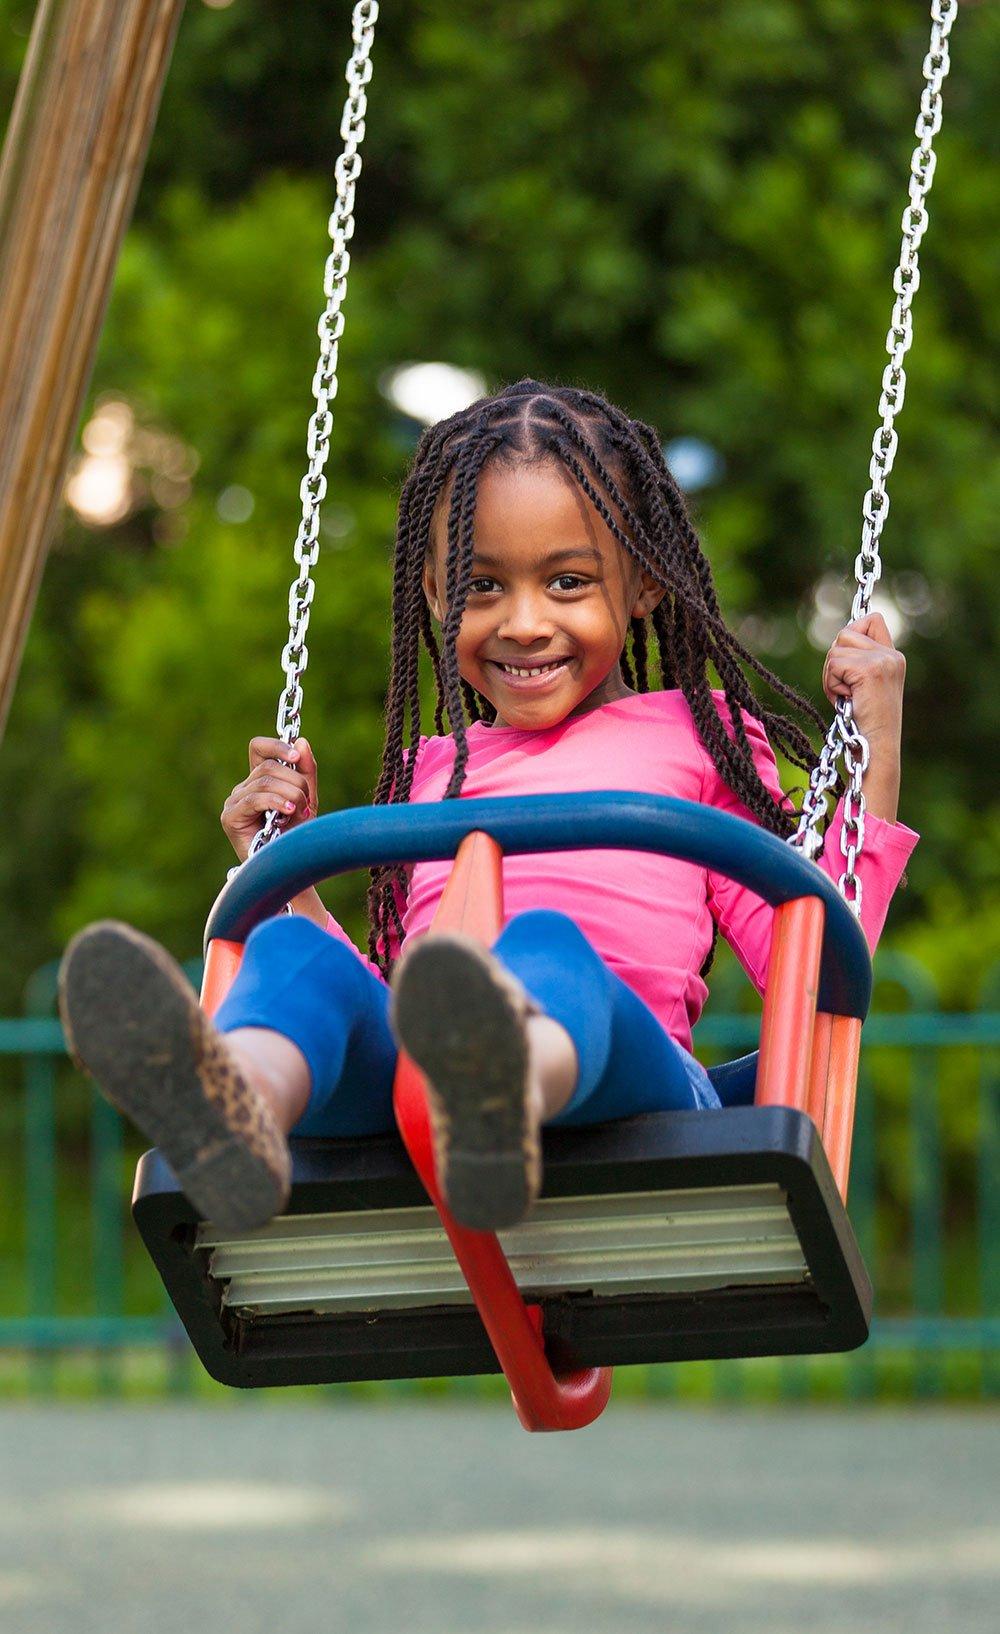 Girl on swing in a neighborhood park